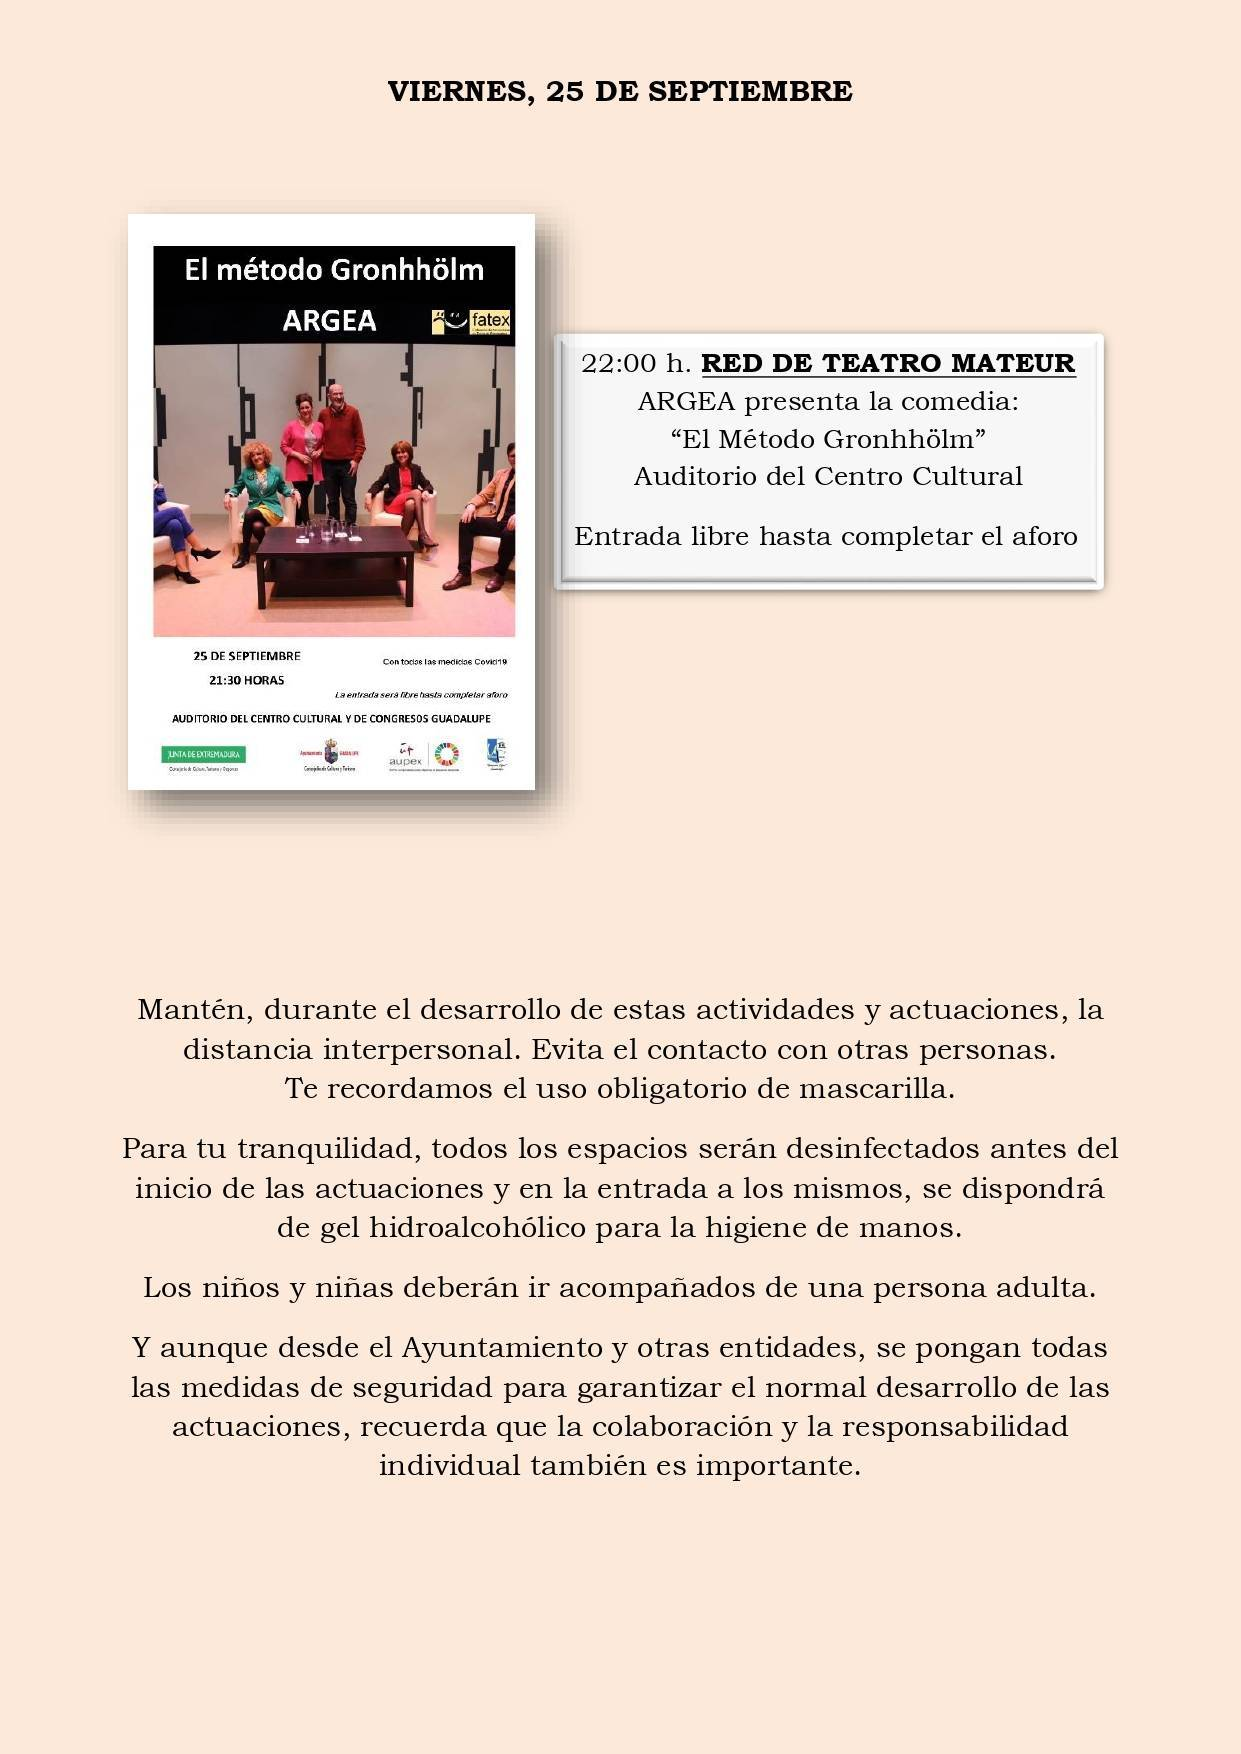 Programa cultural de verano 2020 - Guadalupe (Cáceres) 10